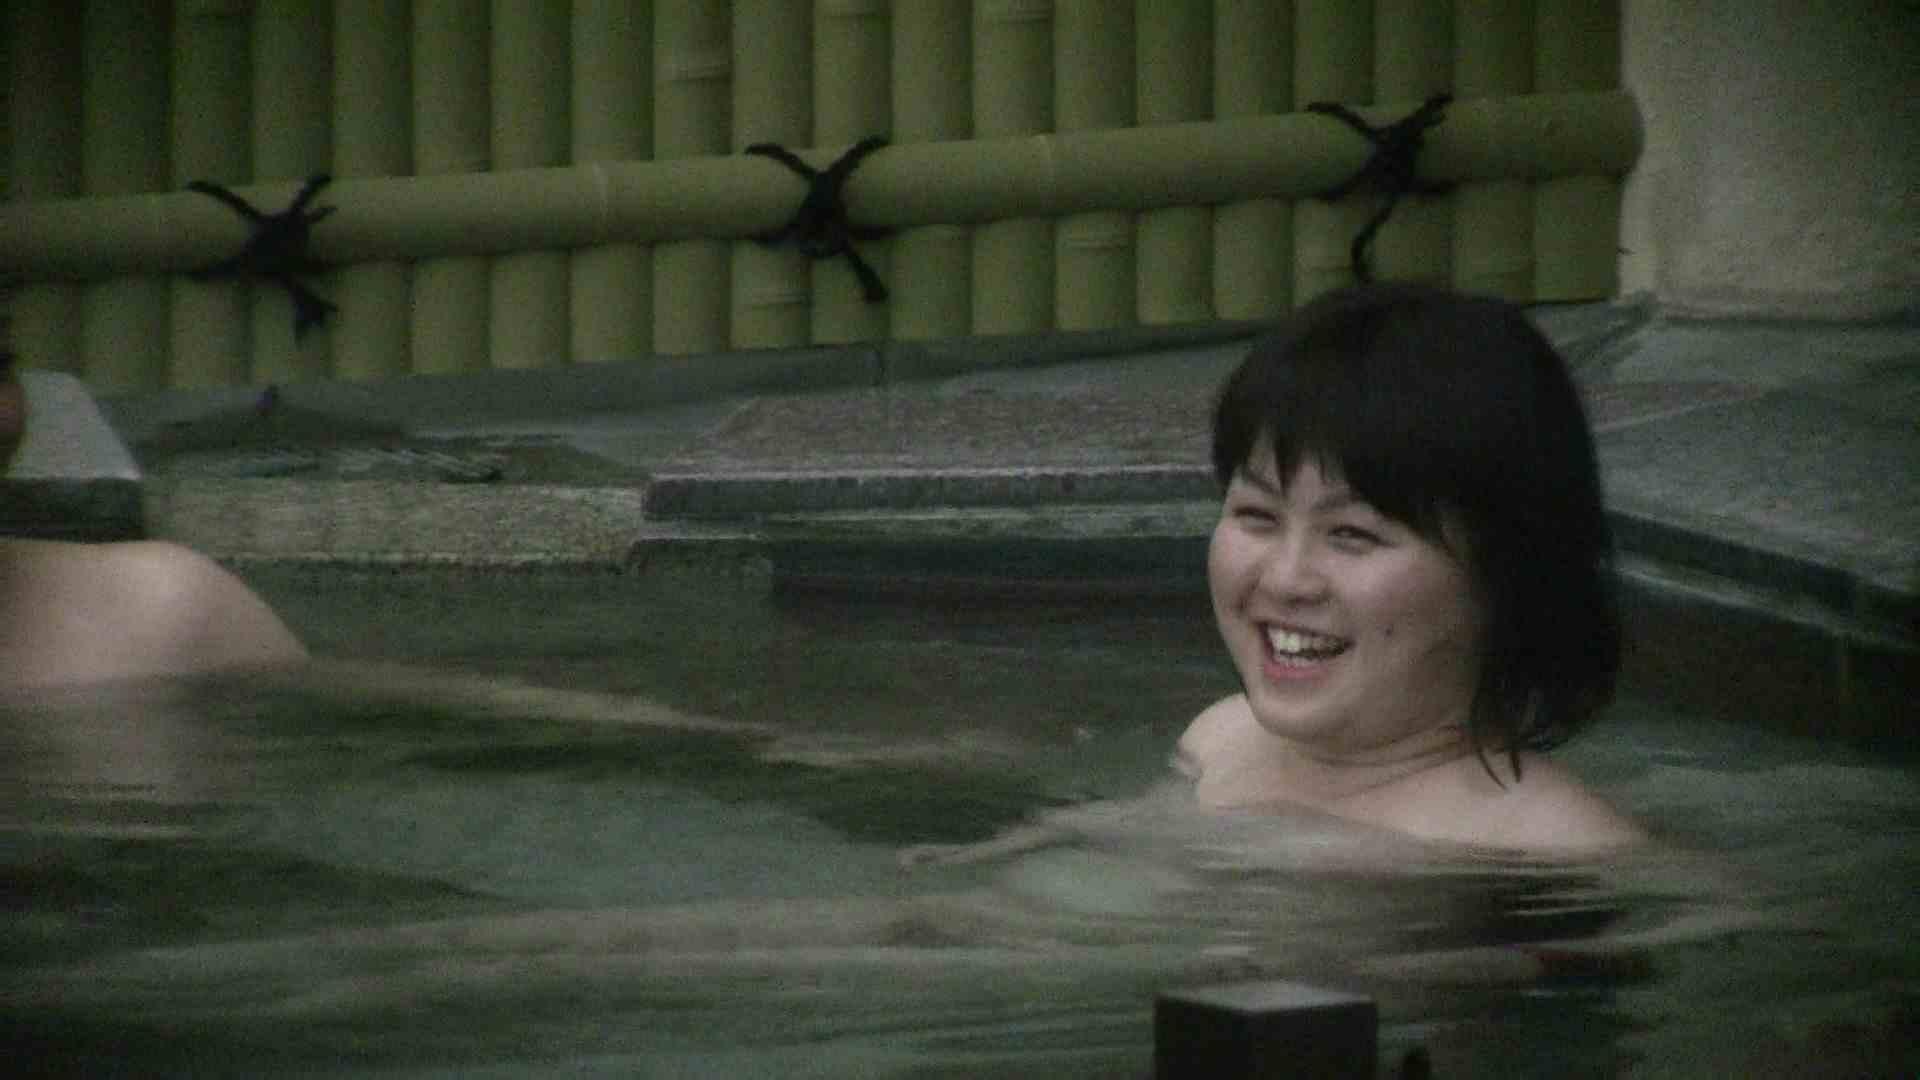 Aquaな露天風呂Vol.539 OL女体 | 露天  88連発 85